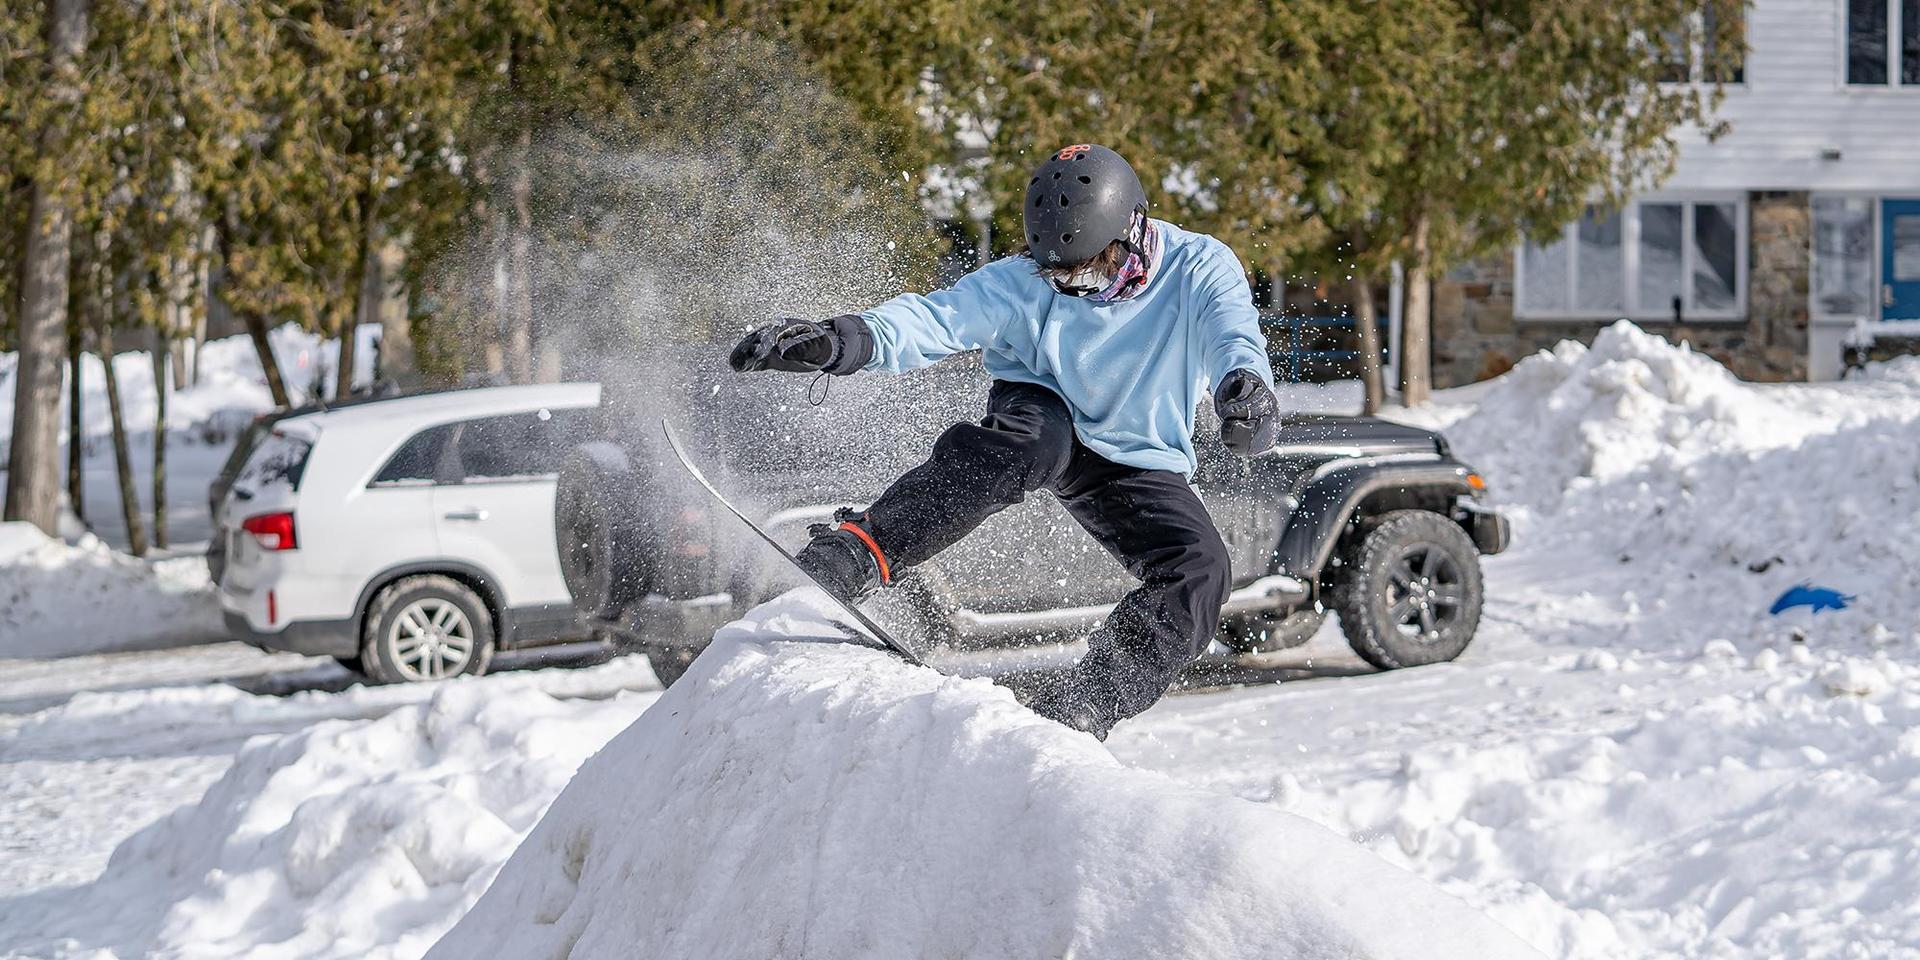 A student kicking up a cloud of snow after landing an impressive snowboard trick.